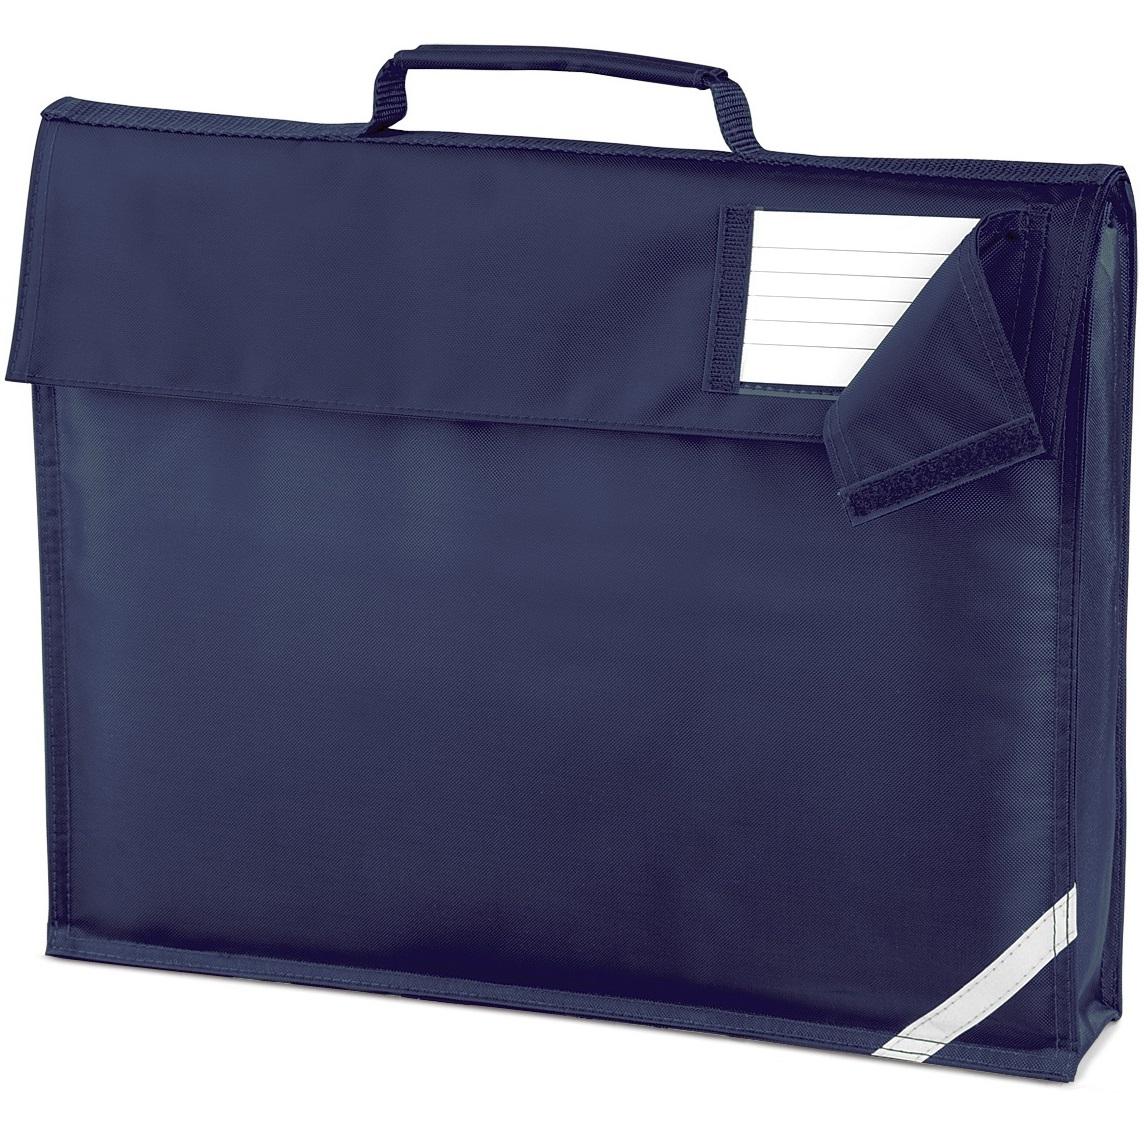 QD051 Junior book bag – GDB Manufacturing